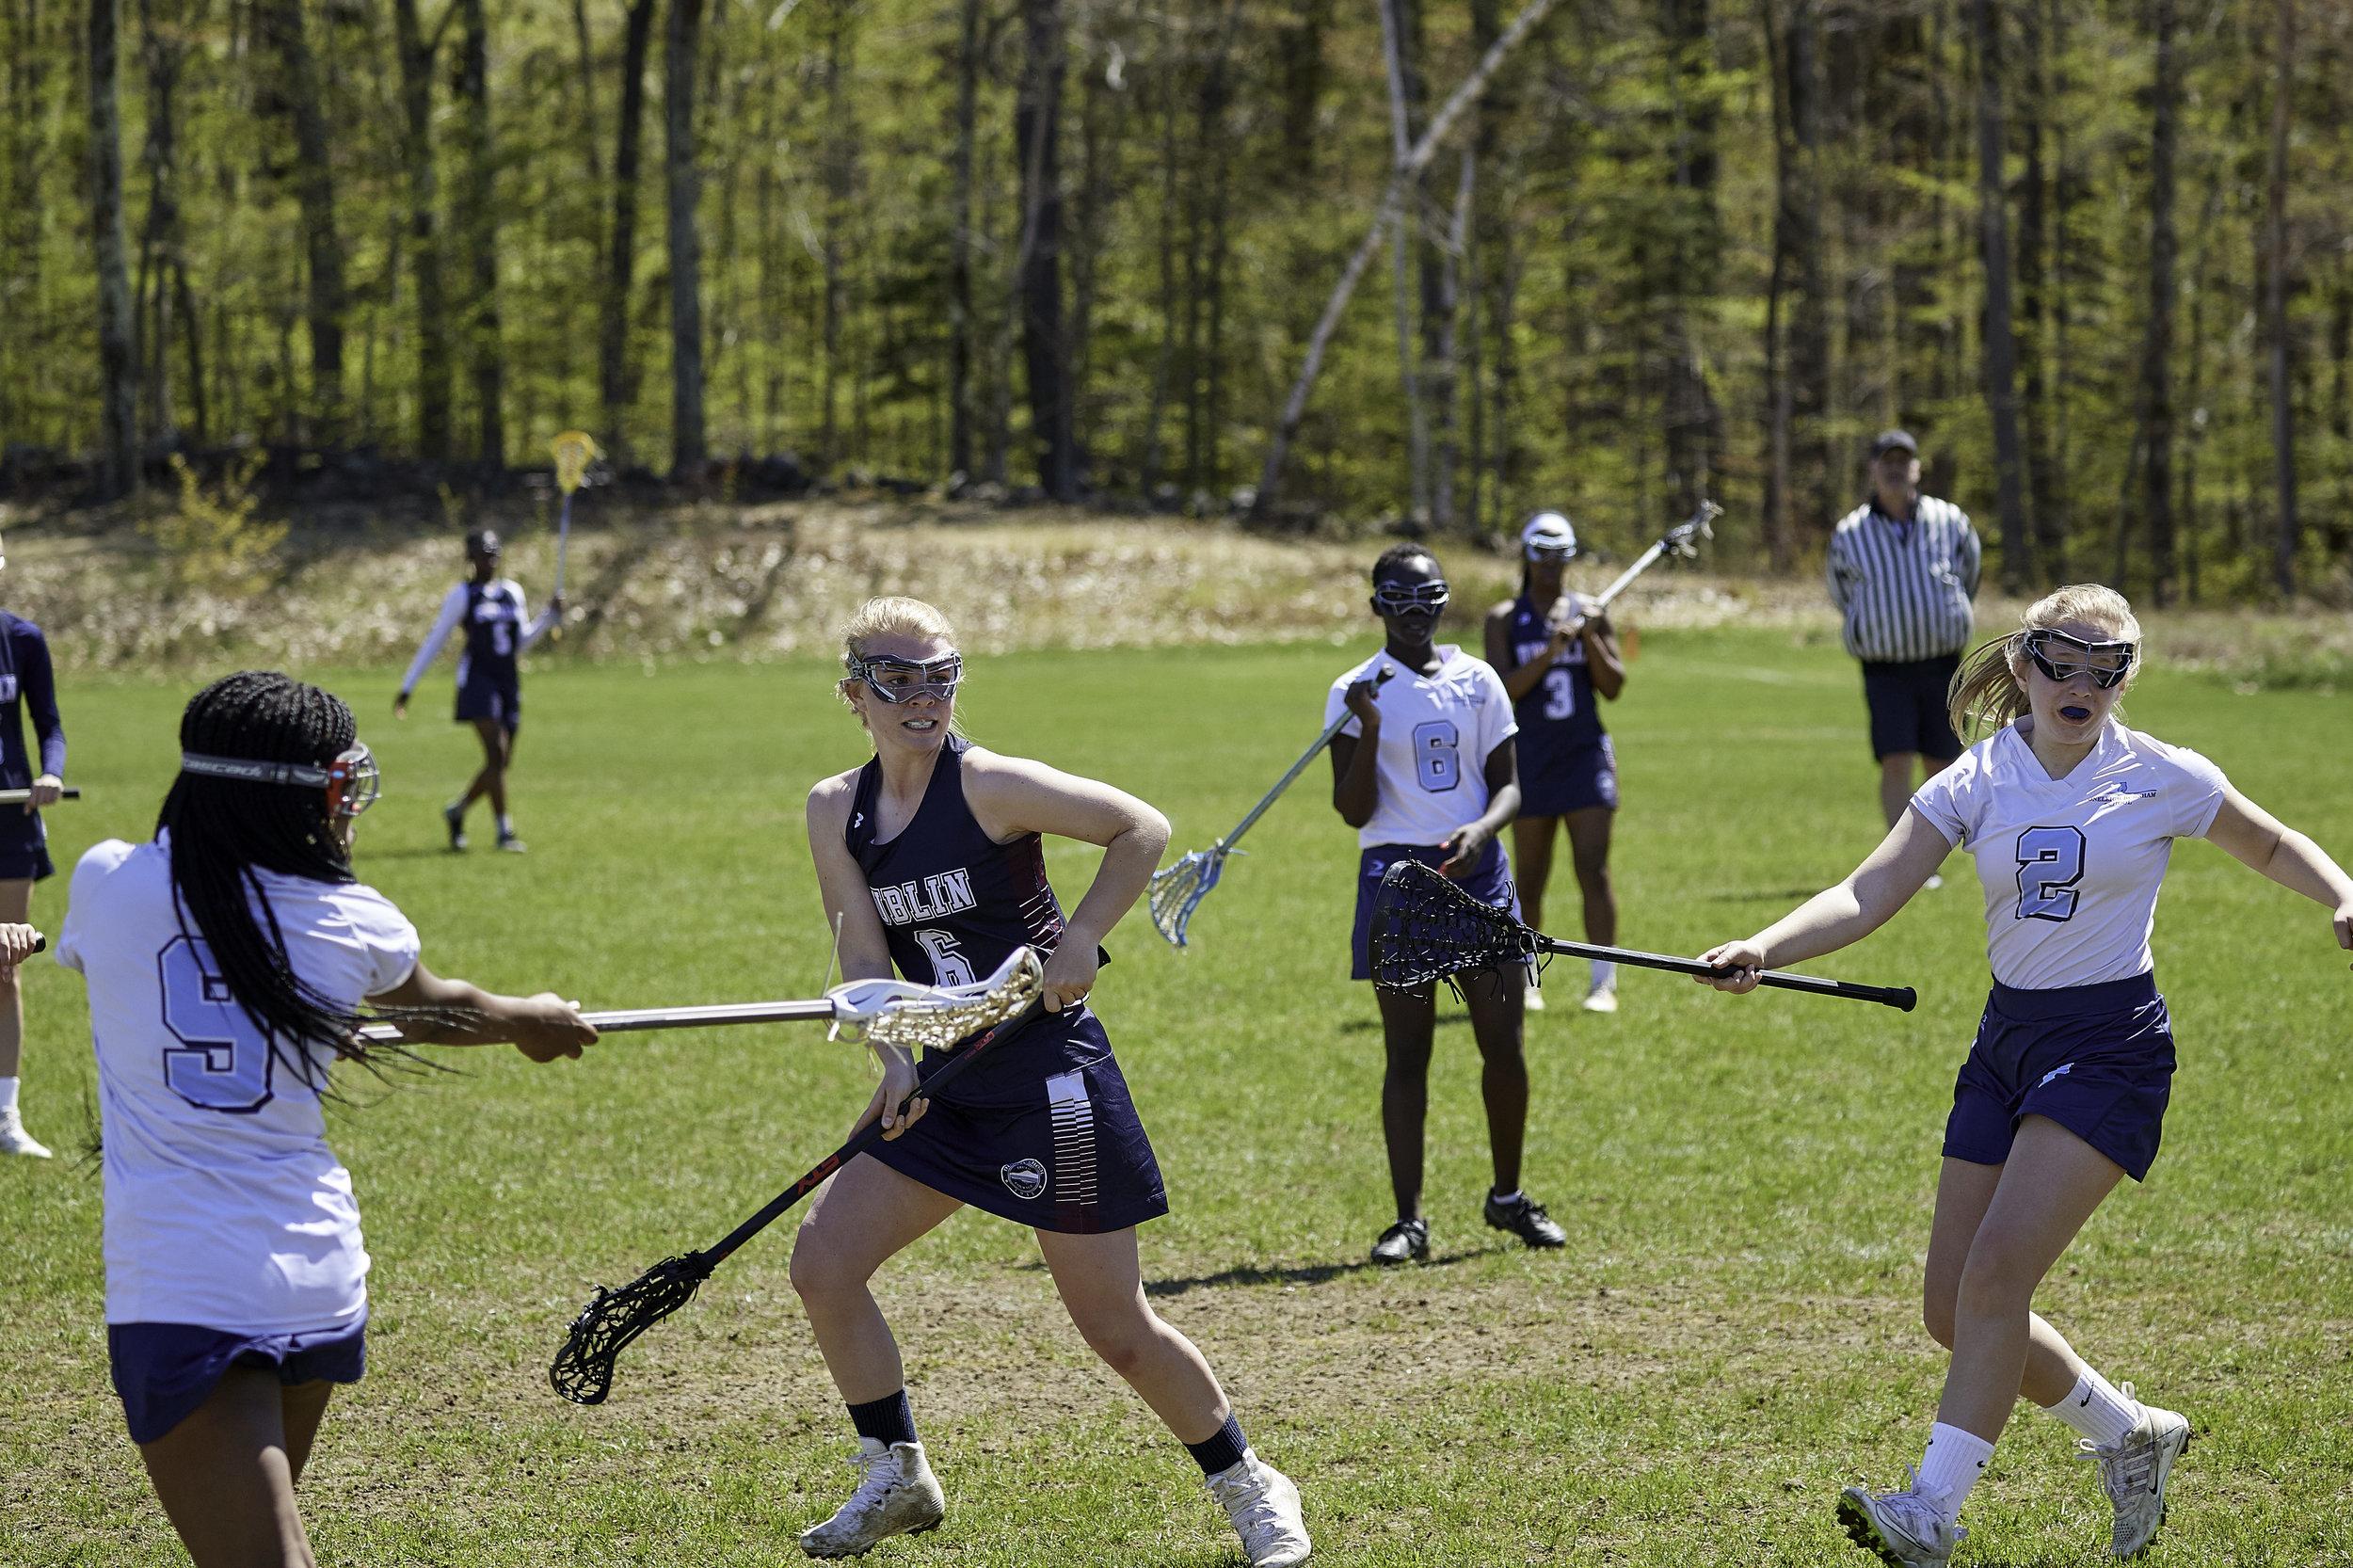 Girls Lacrosse vs. Stoneleigh Burnham School - May 11, 2019 - May 10, 2019193261.jpg